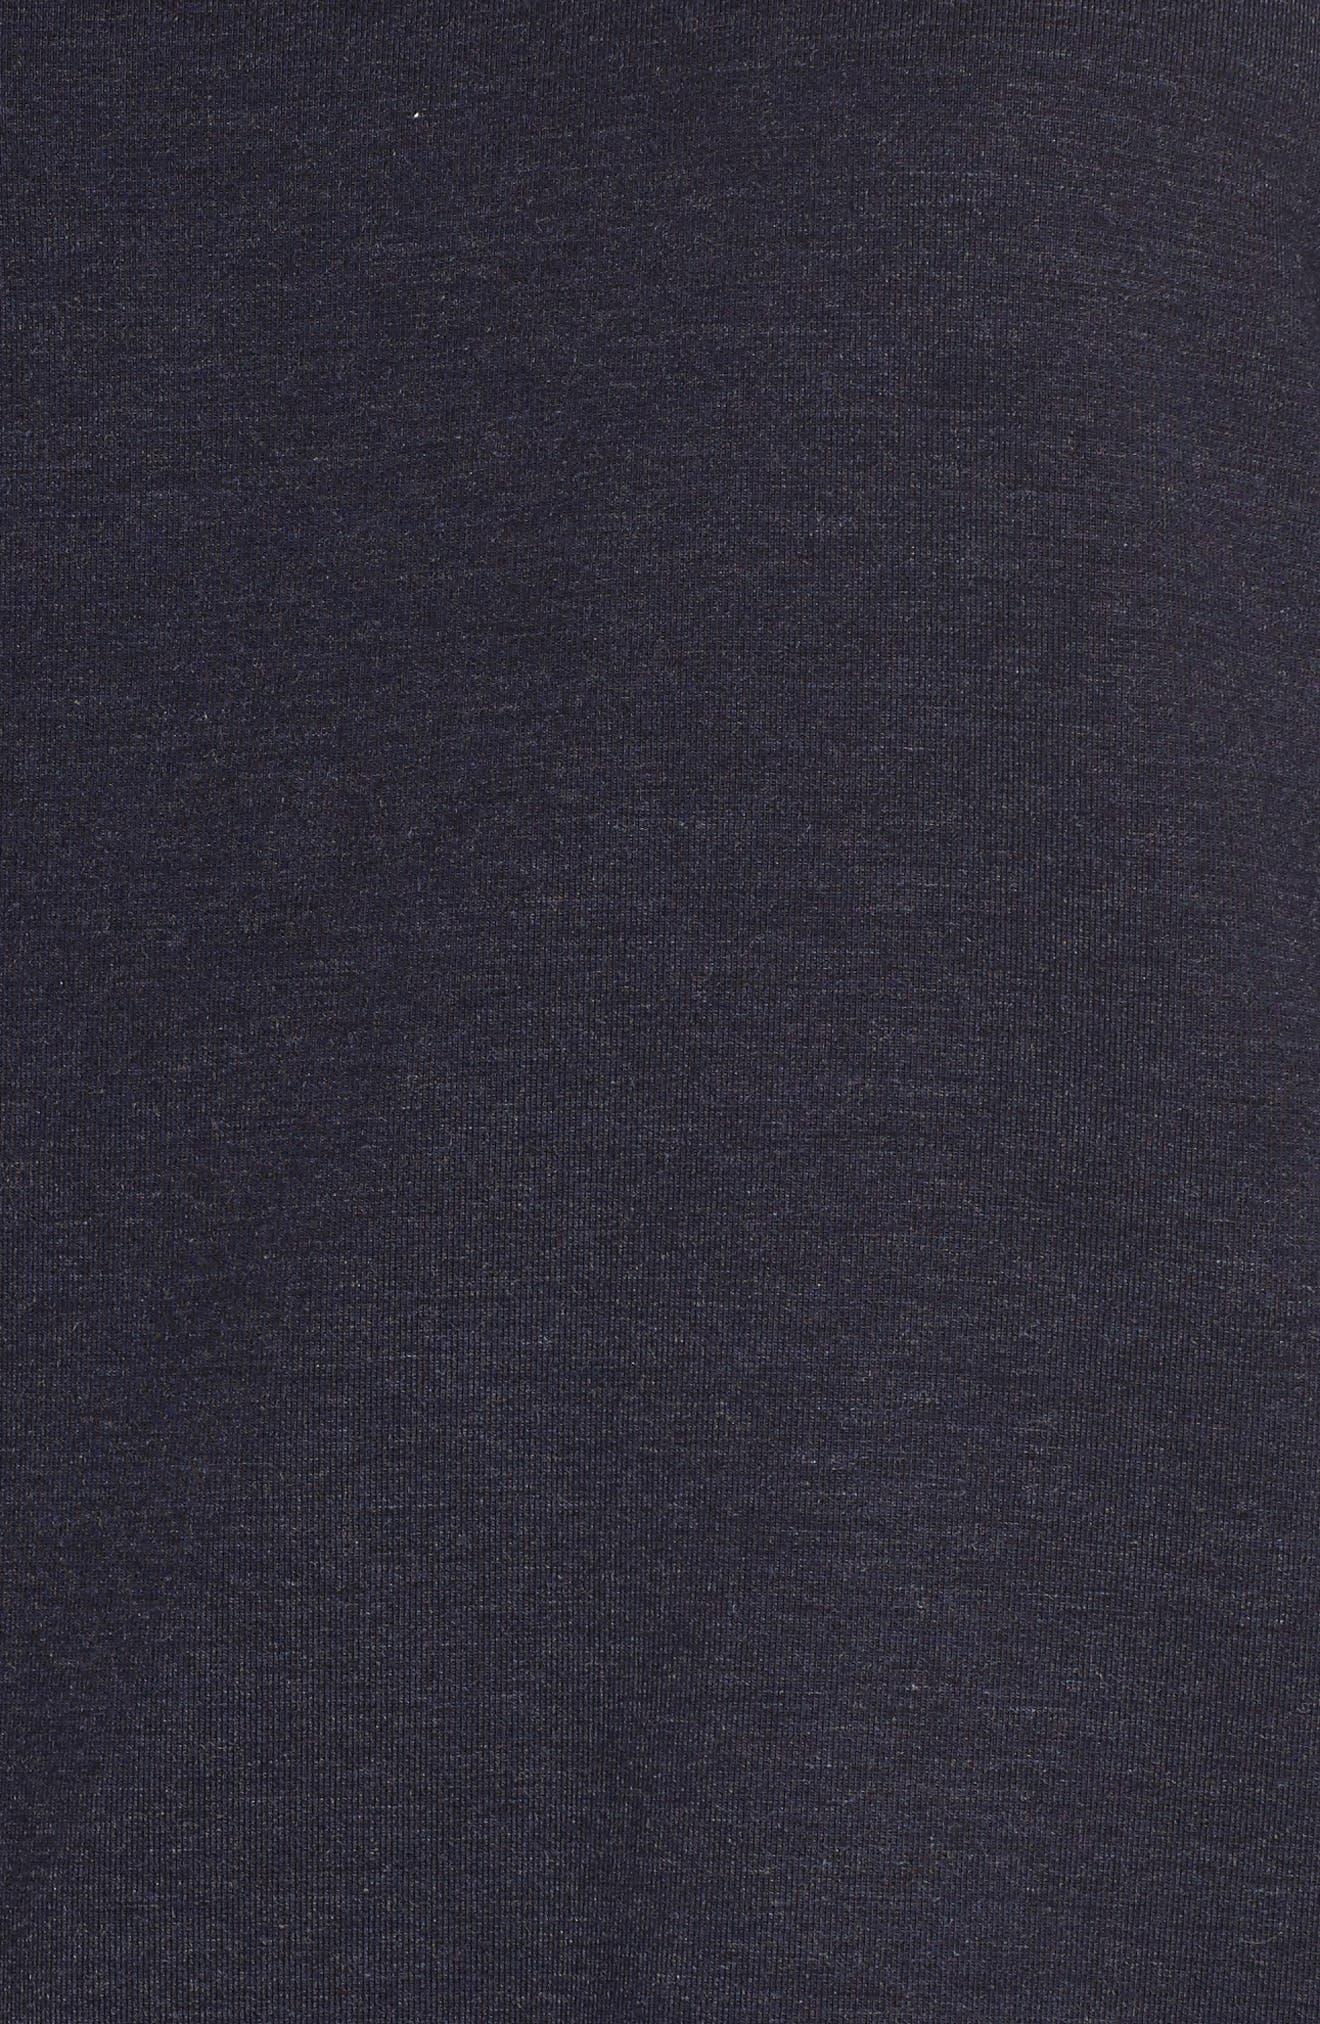 Poplin & Lace Crewneck Sweatshirt,                             Alternate thumbnail 5, color,                             410